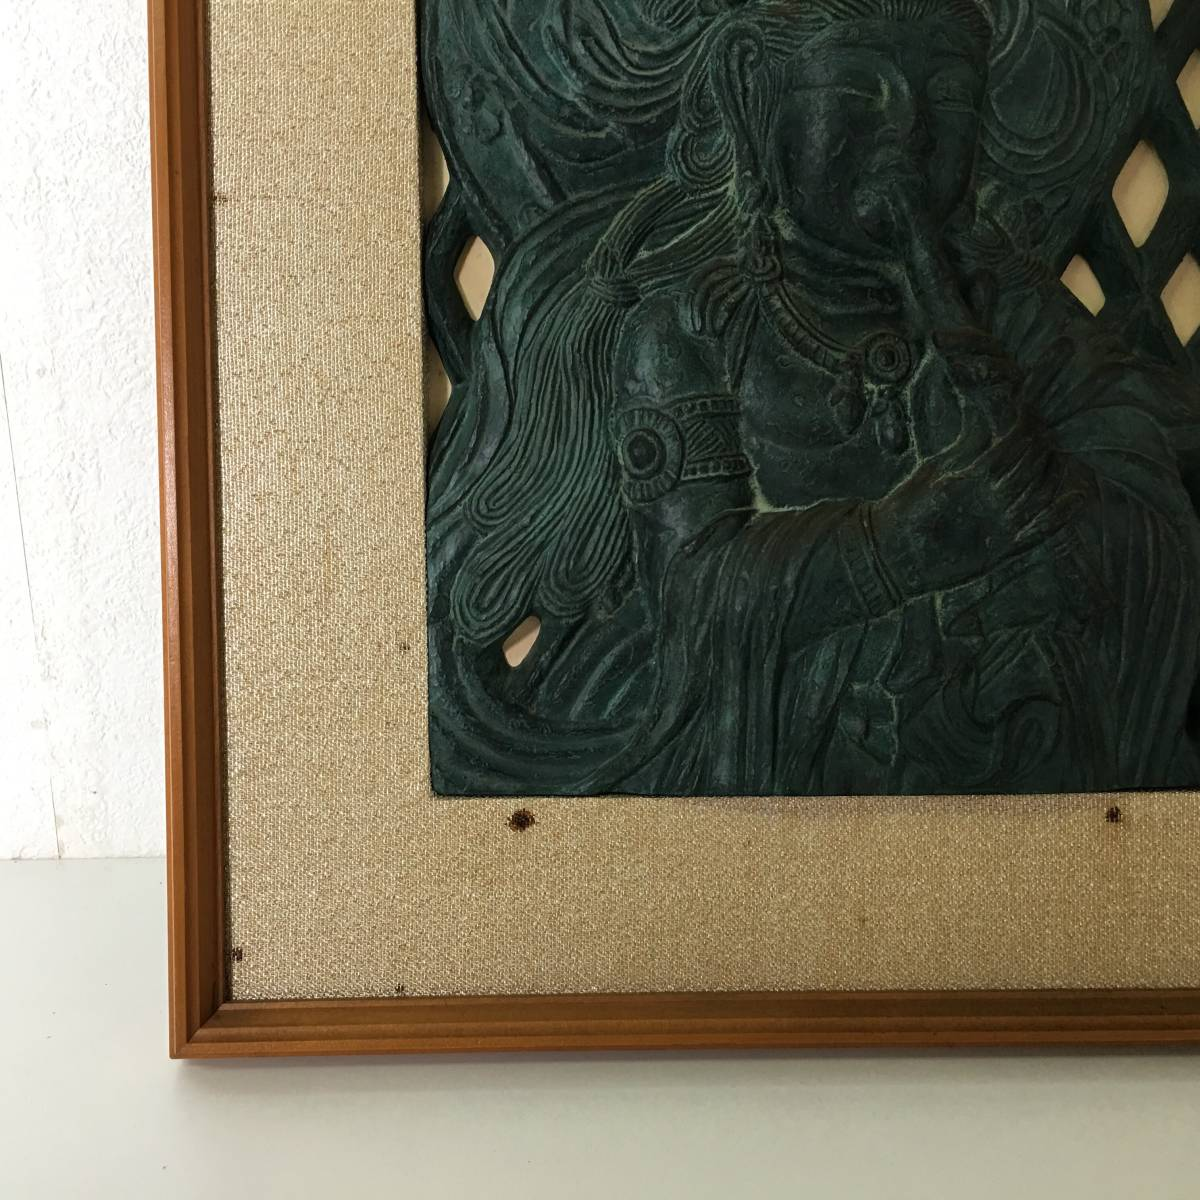 kt11/120 レリーフ 観音像 京都科学標本株式会社 cimastone replicas 額47×37×3cm 陶器製? 壁掛け 工芸美術品_画像6